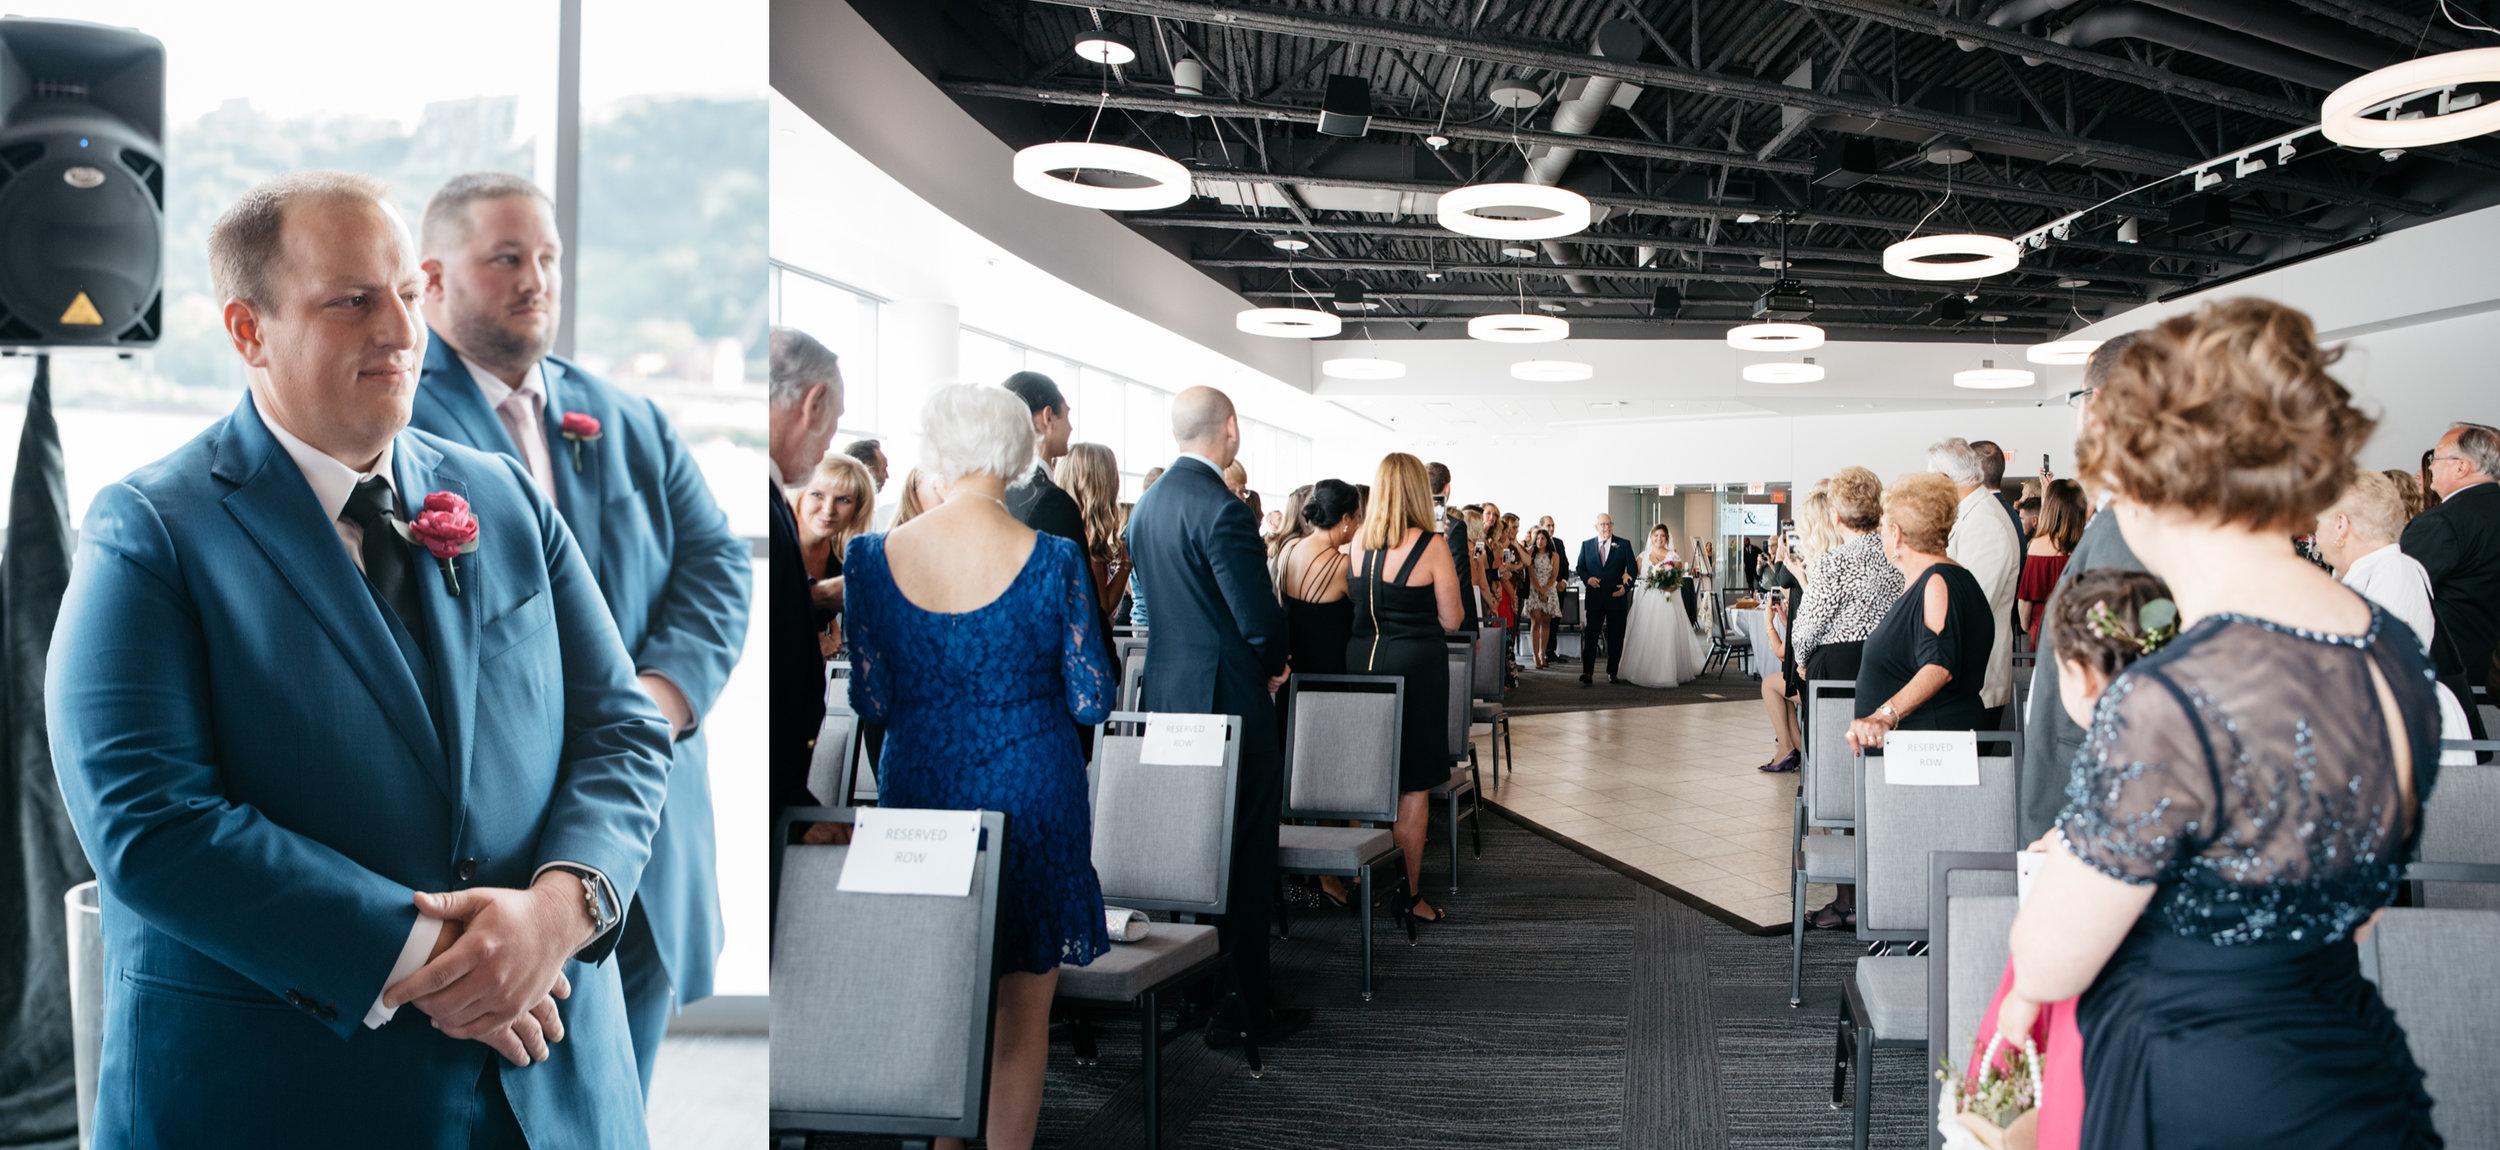 Pointview Hall, Carnegie Science Center wedding Mariah Fisher.jpg